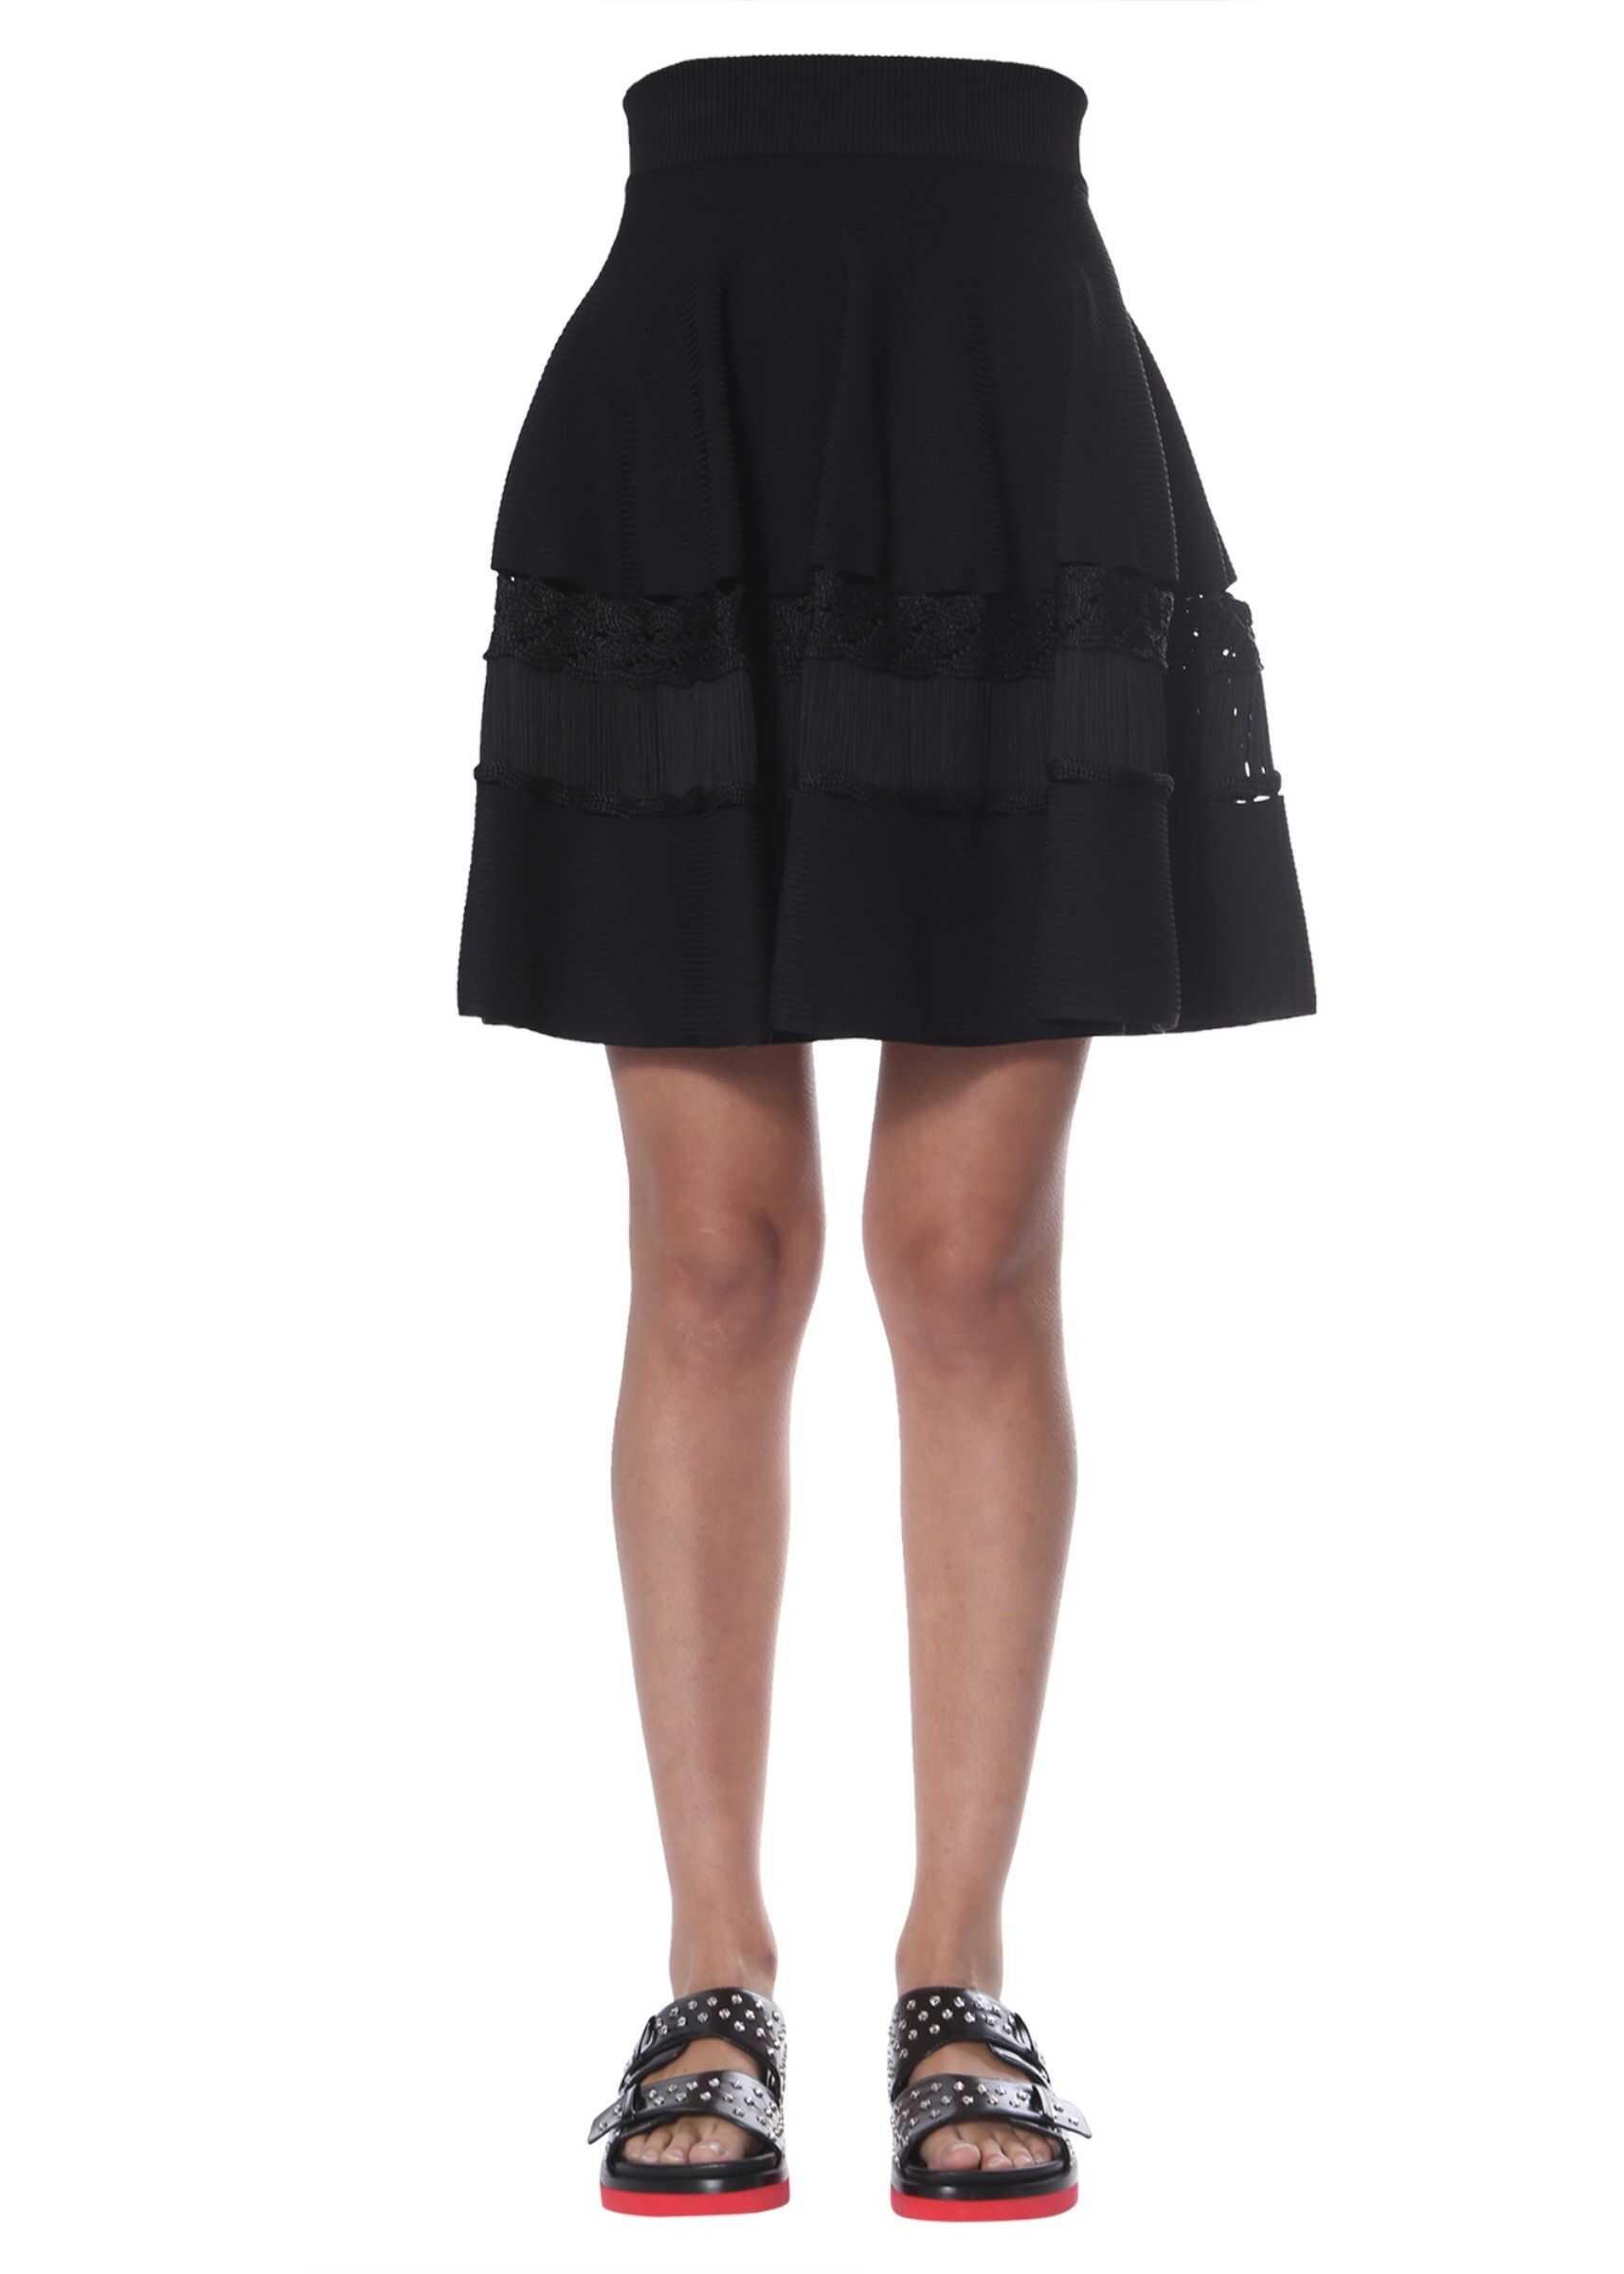 Alexander McQueen Knitted Skirt BLACK